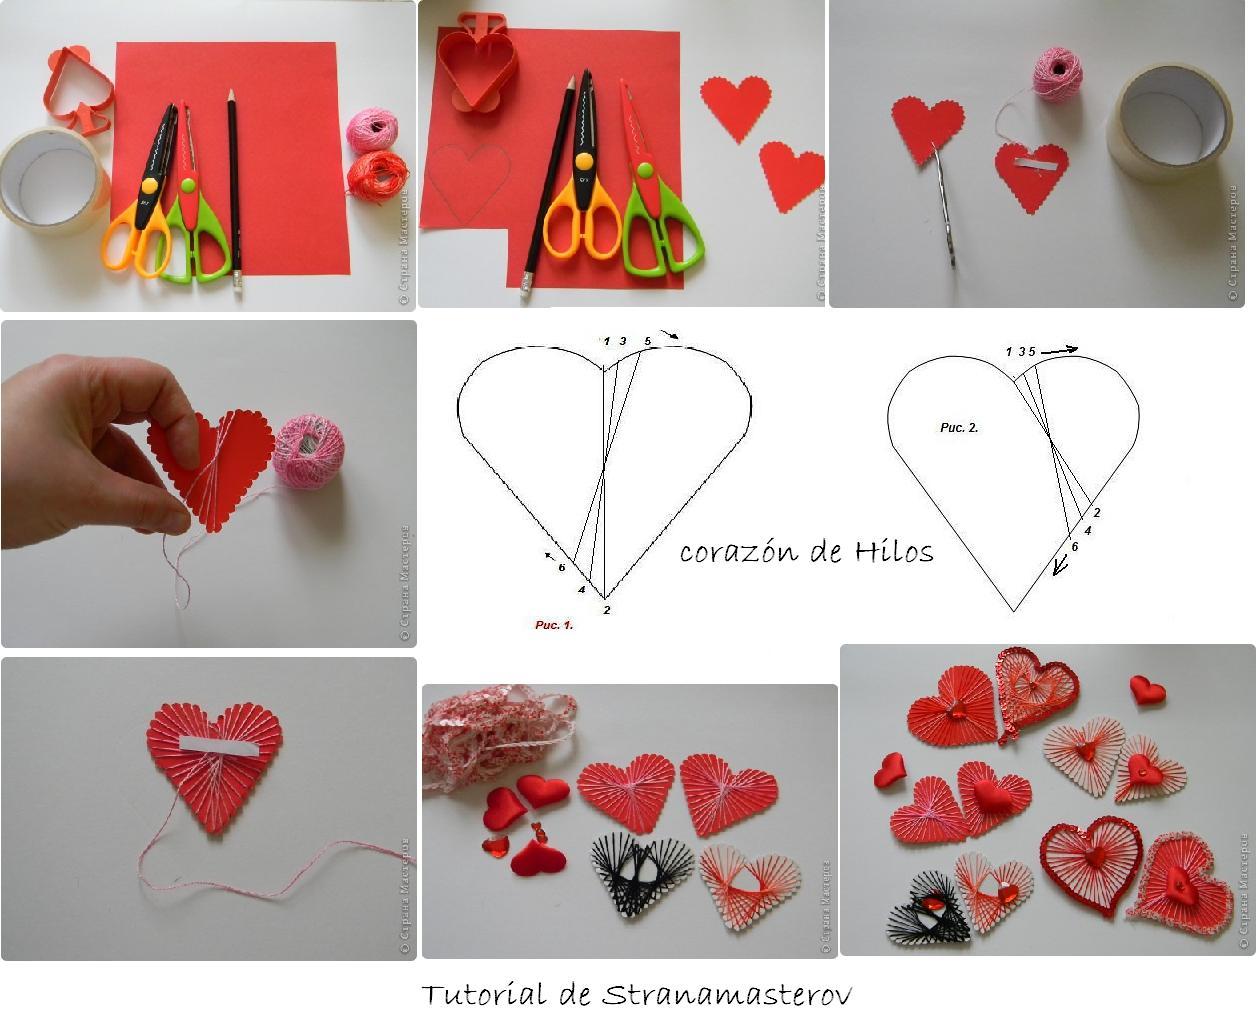 manualidades, San Valentín, fiestas, amor, love, crafts, diys